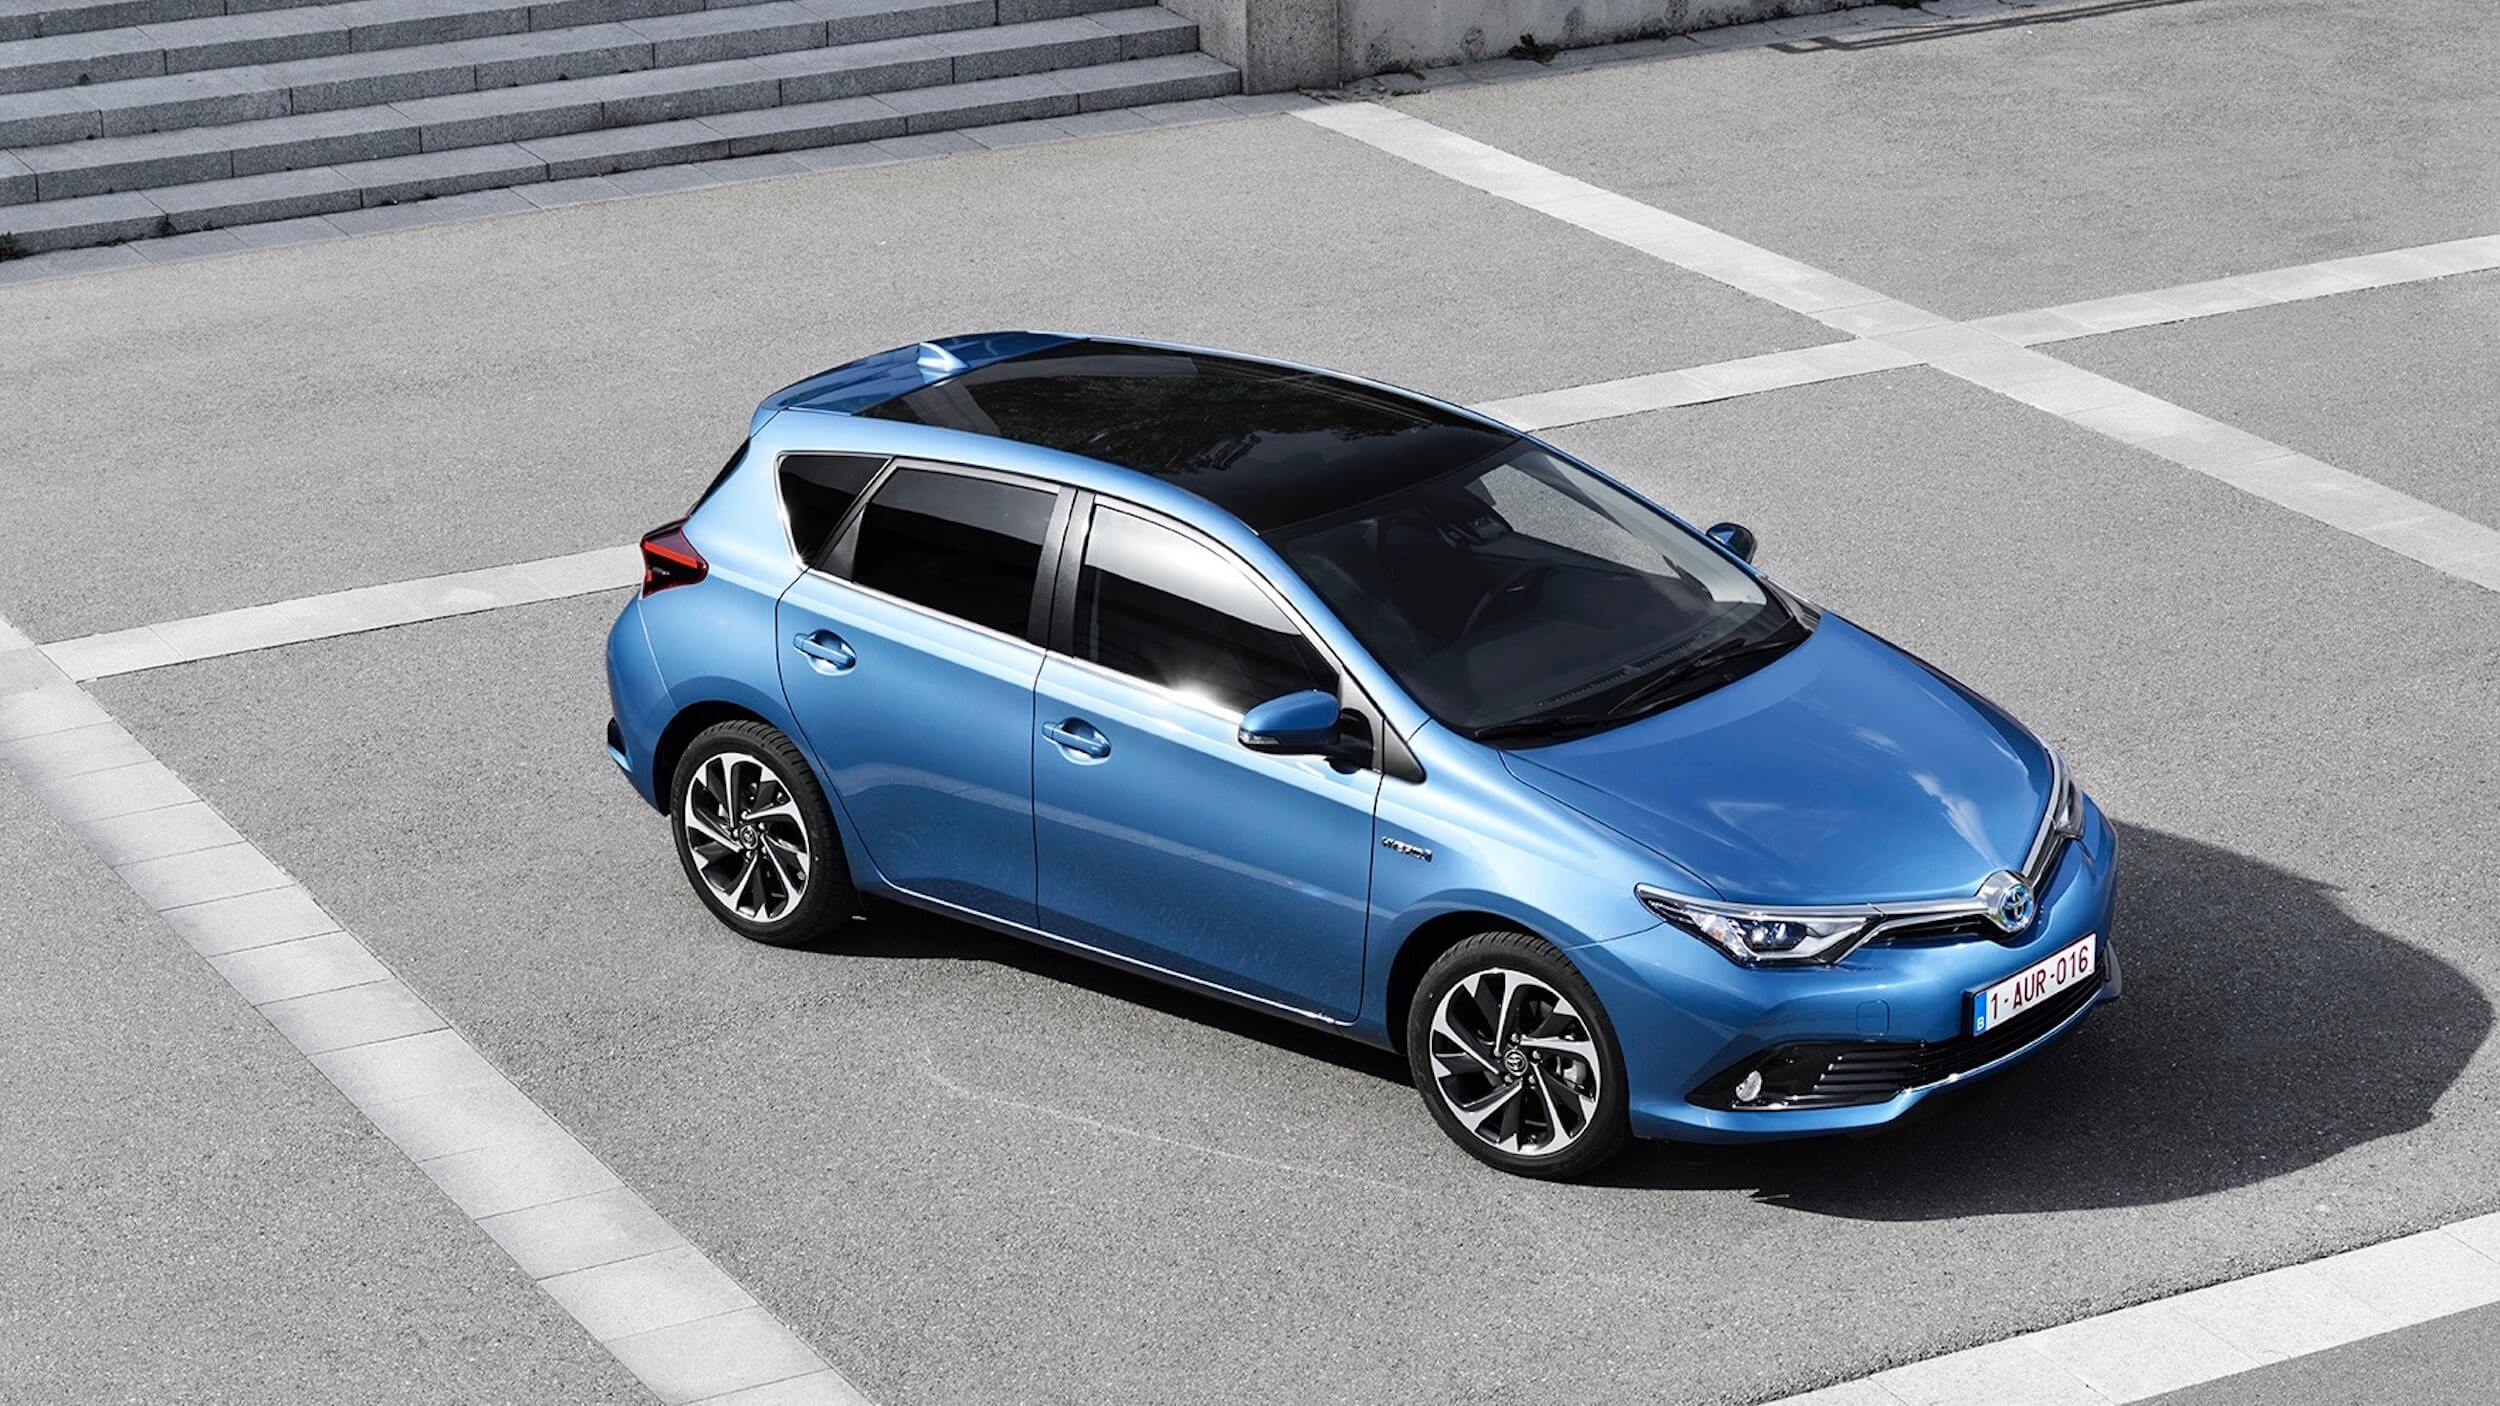 Blauwe Toyota Auris